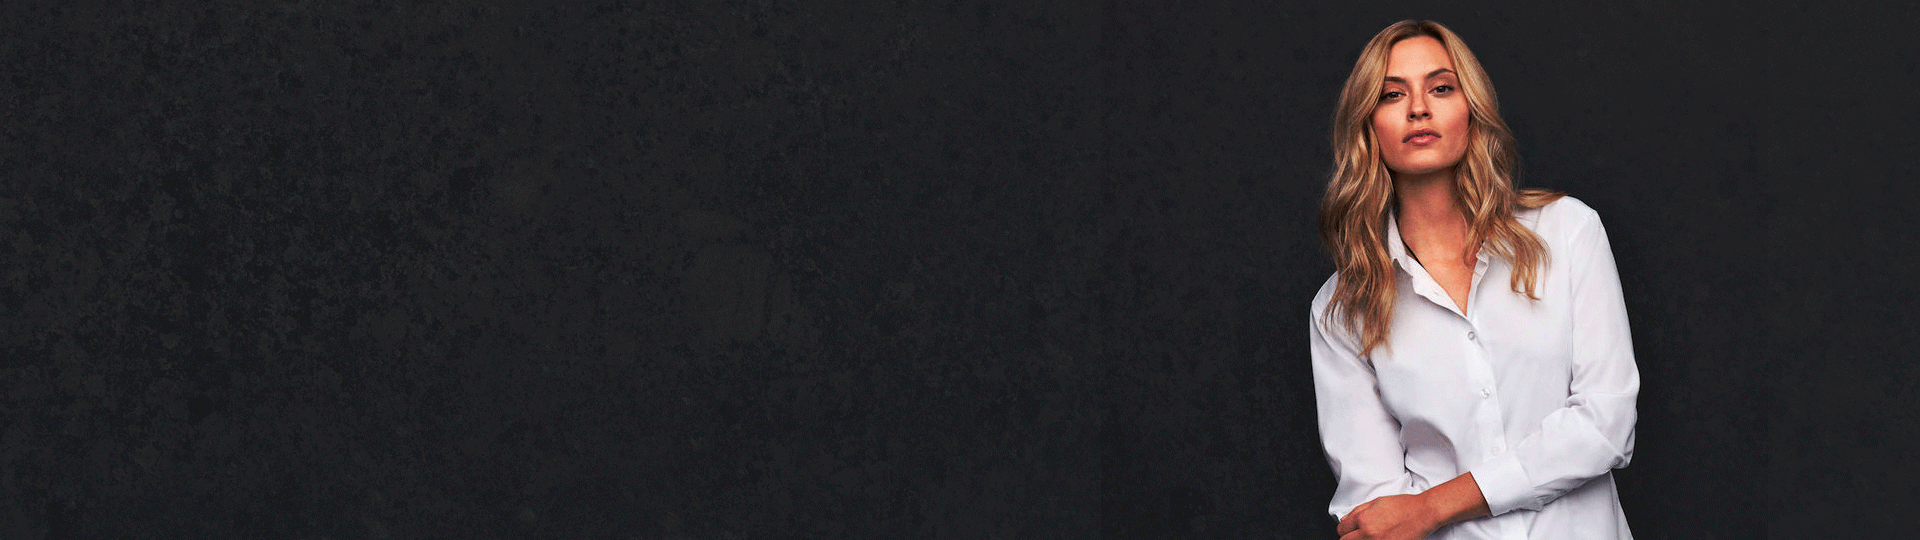 Profiltøj banner